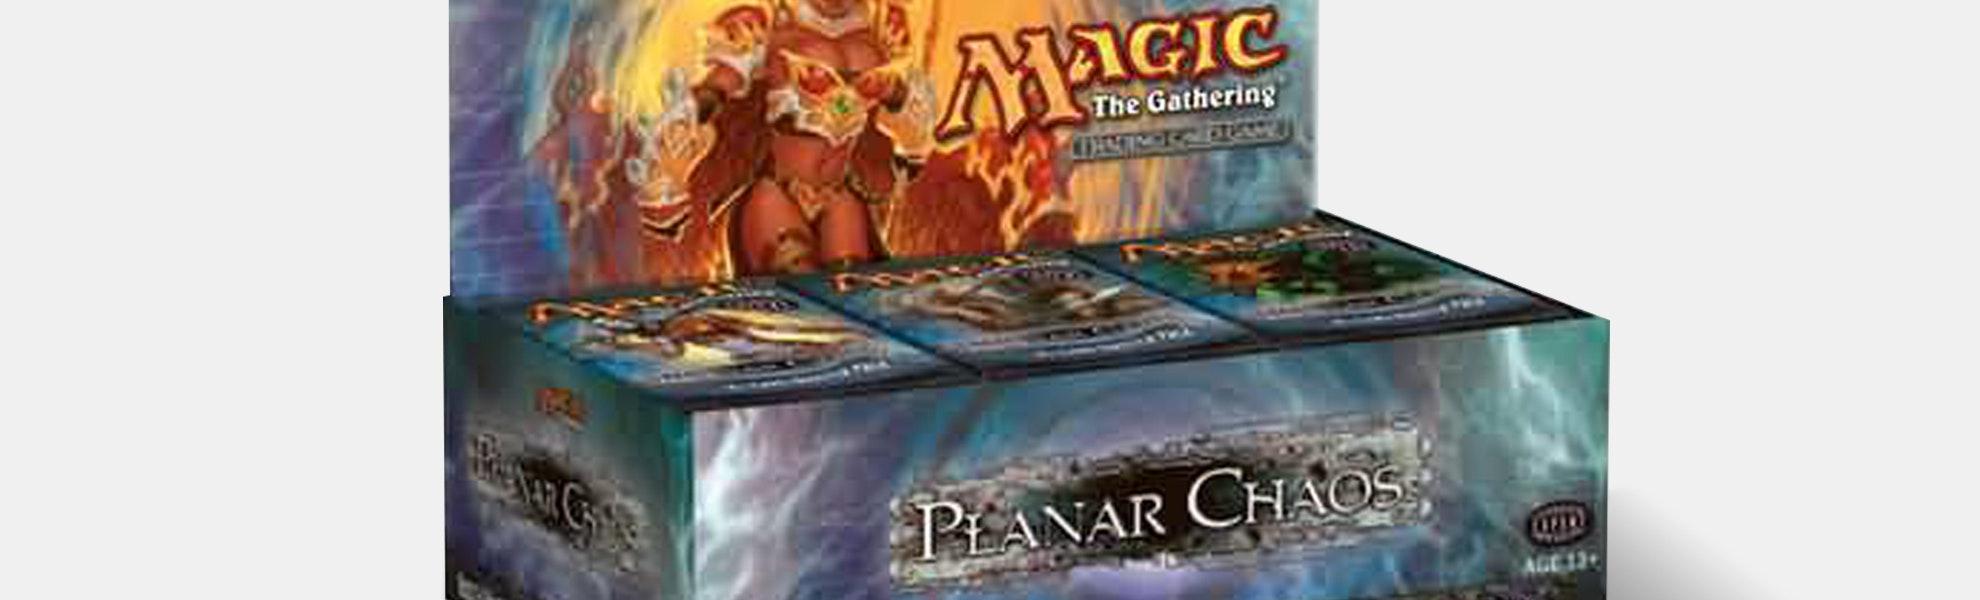 Planar Chaos Booster Box